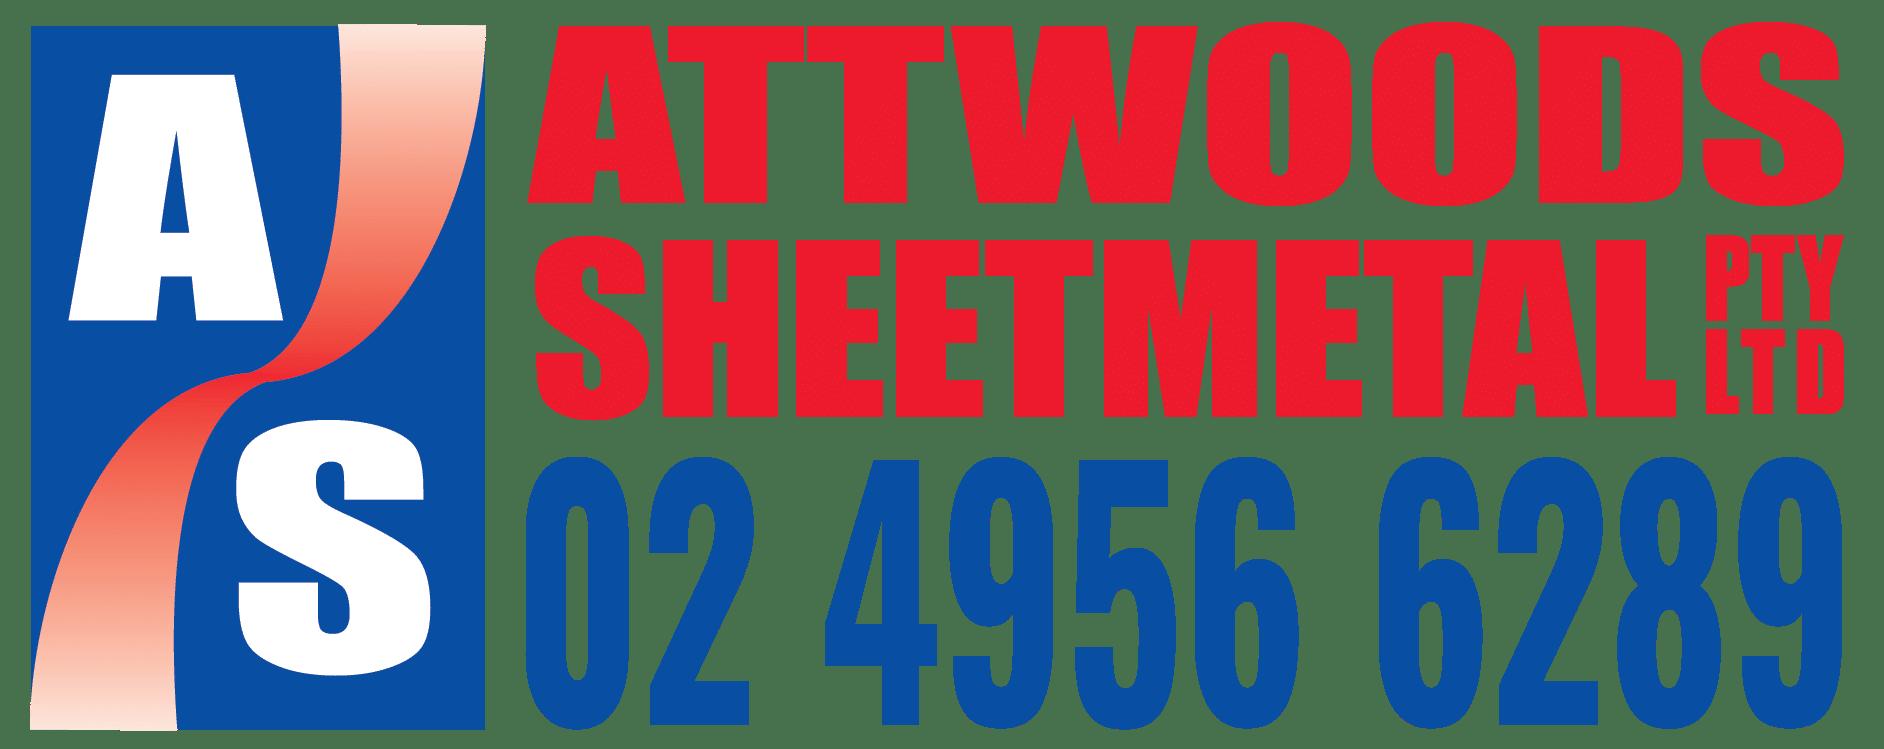 Newcastle Sheet Metal Fabrication - Attwoods Sheetmetal